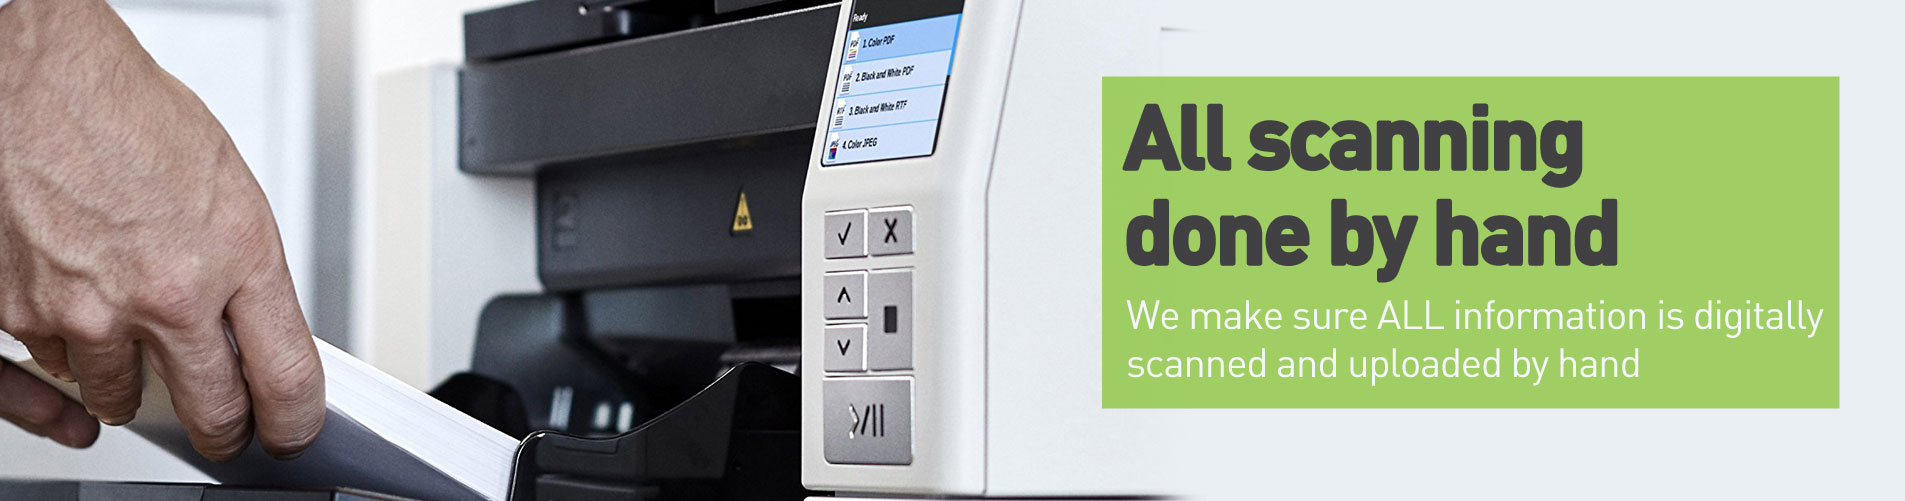 scanning-2018